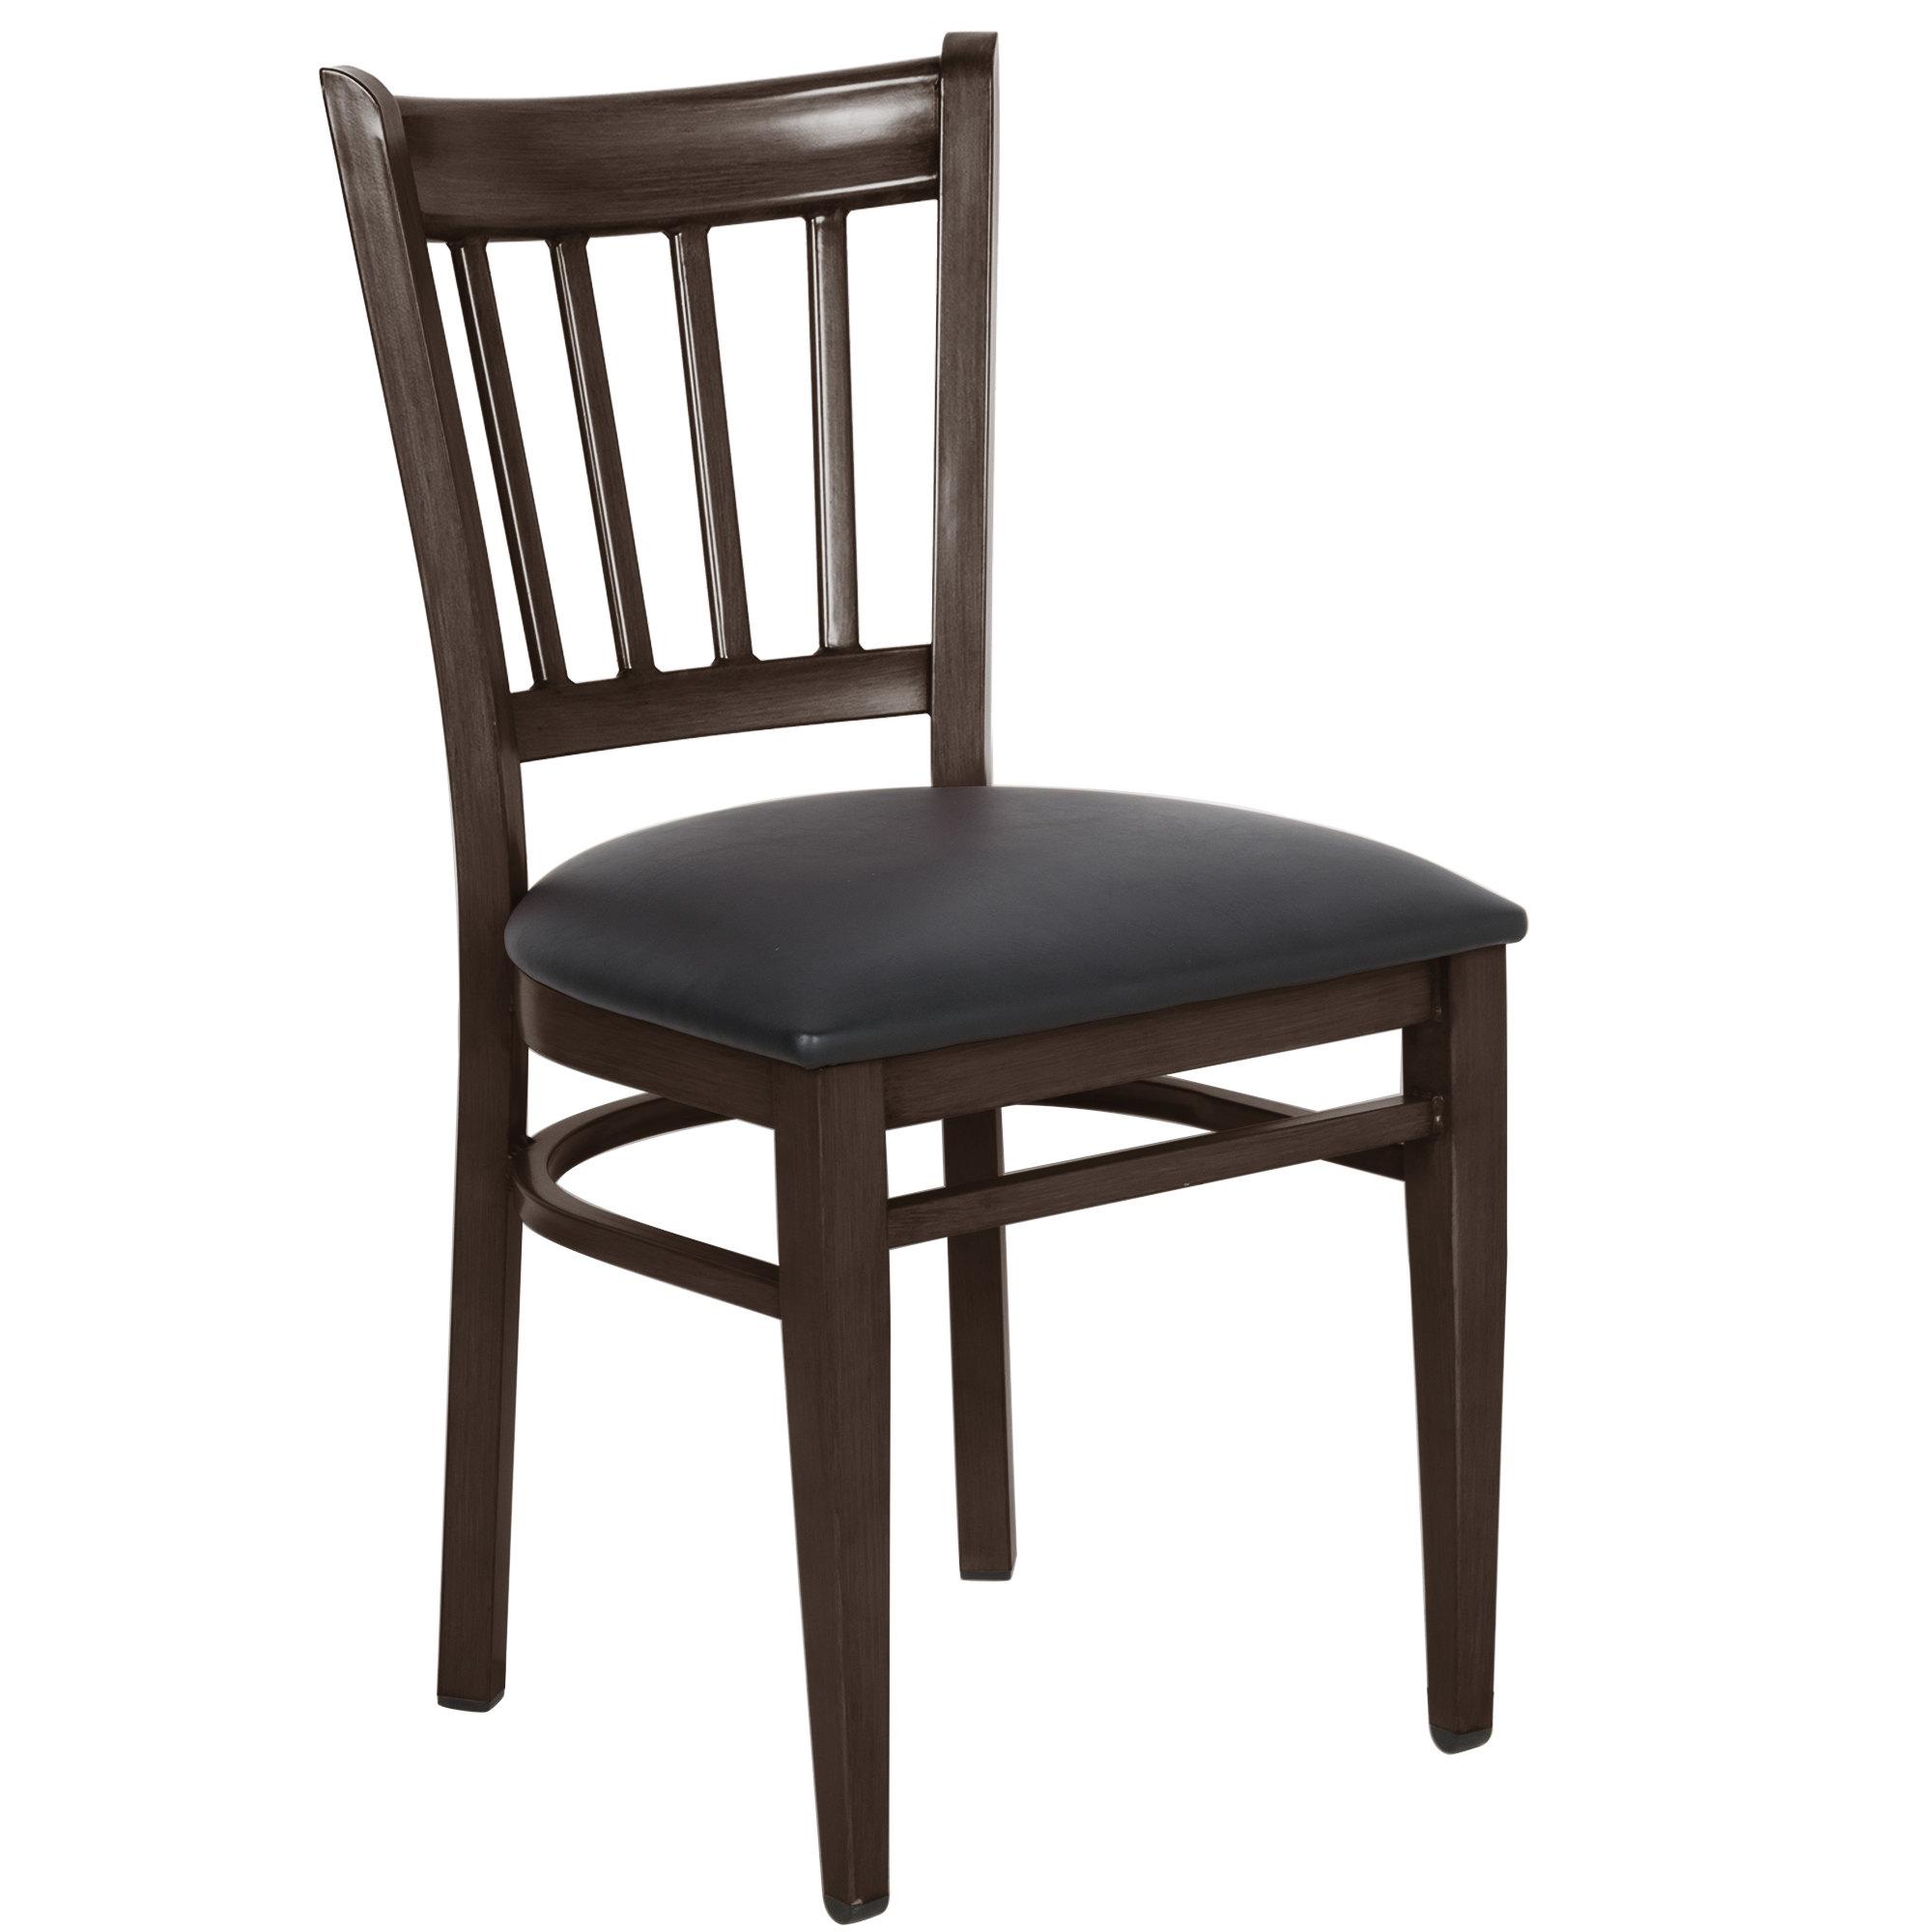 #136 - Slat Back Design Metal Restaurant Chair with Walnut Wood Grain Finish and Black Vinyl Seat